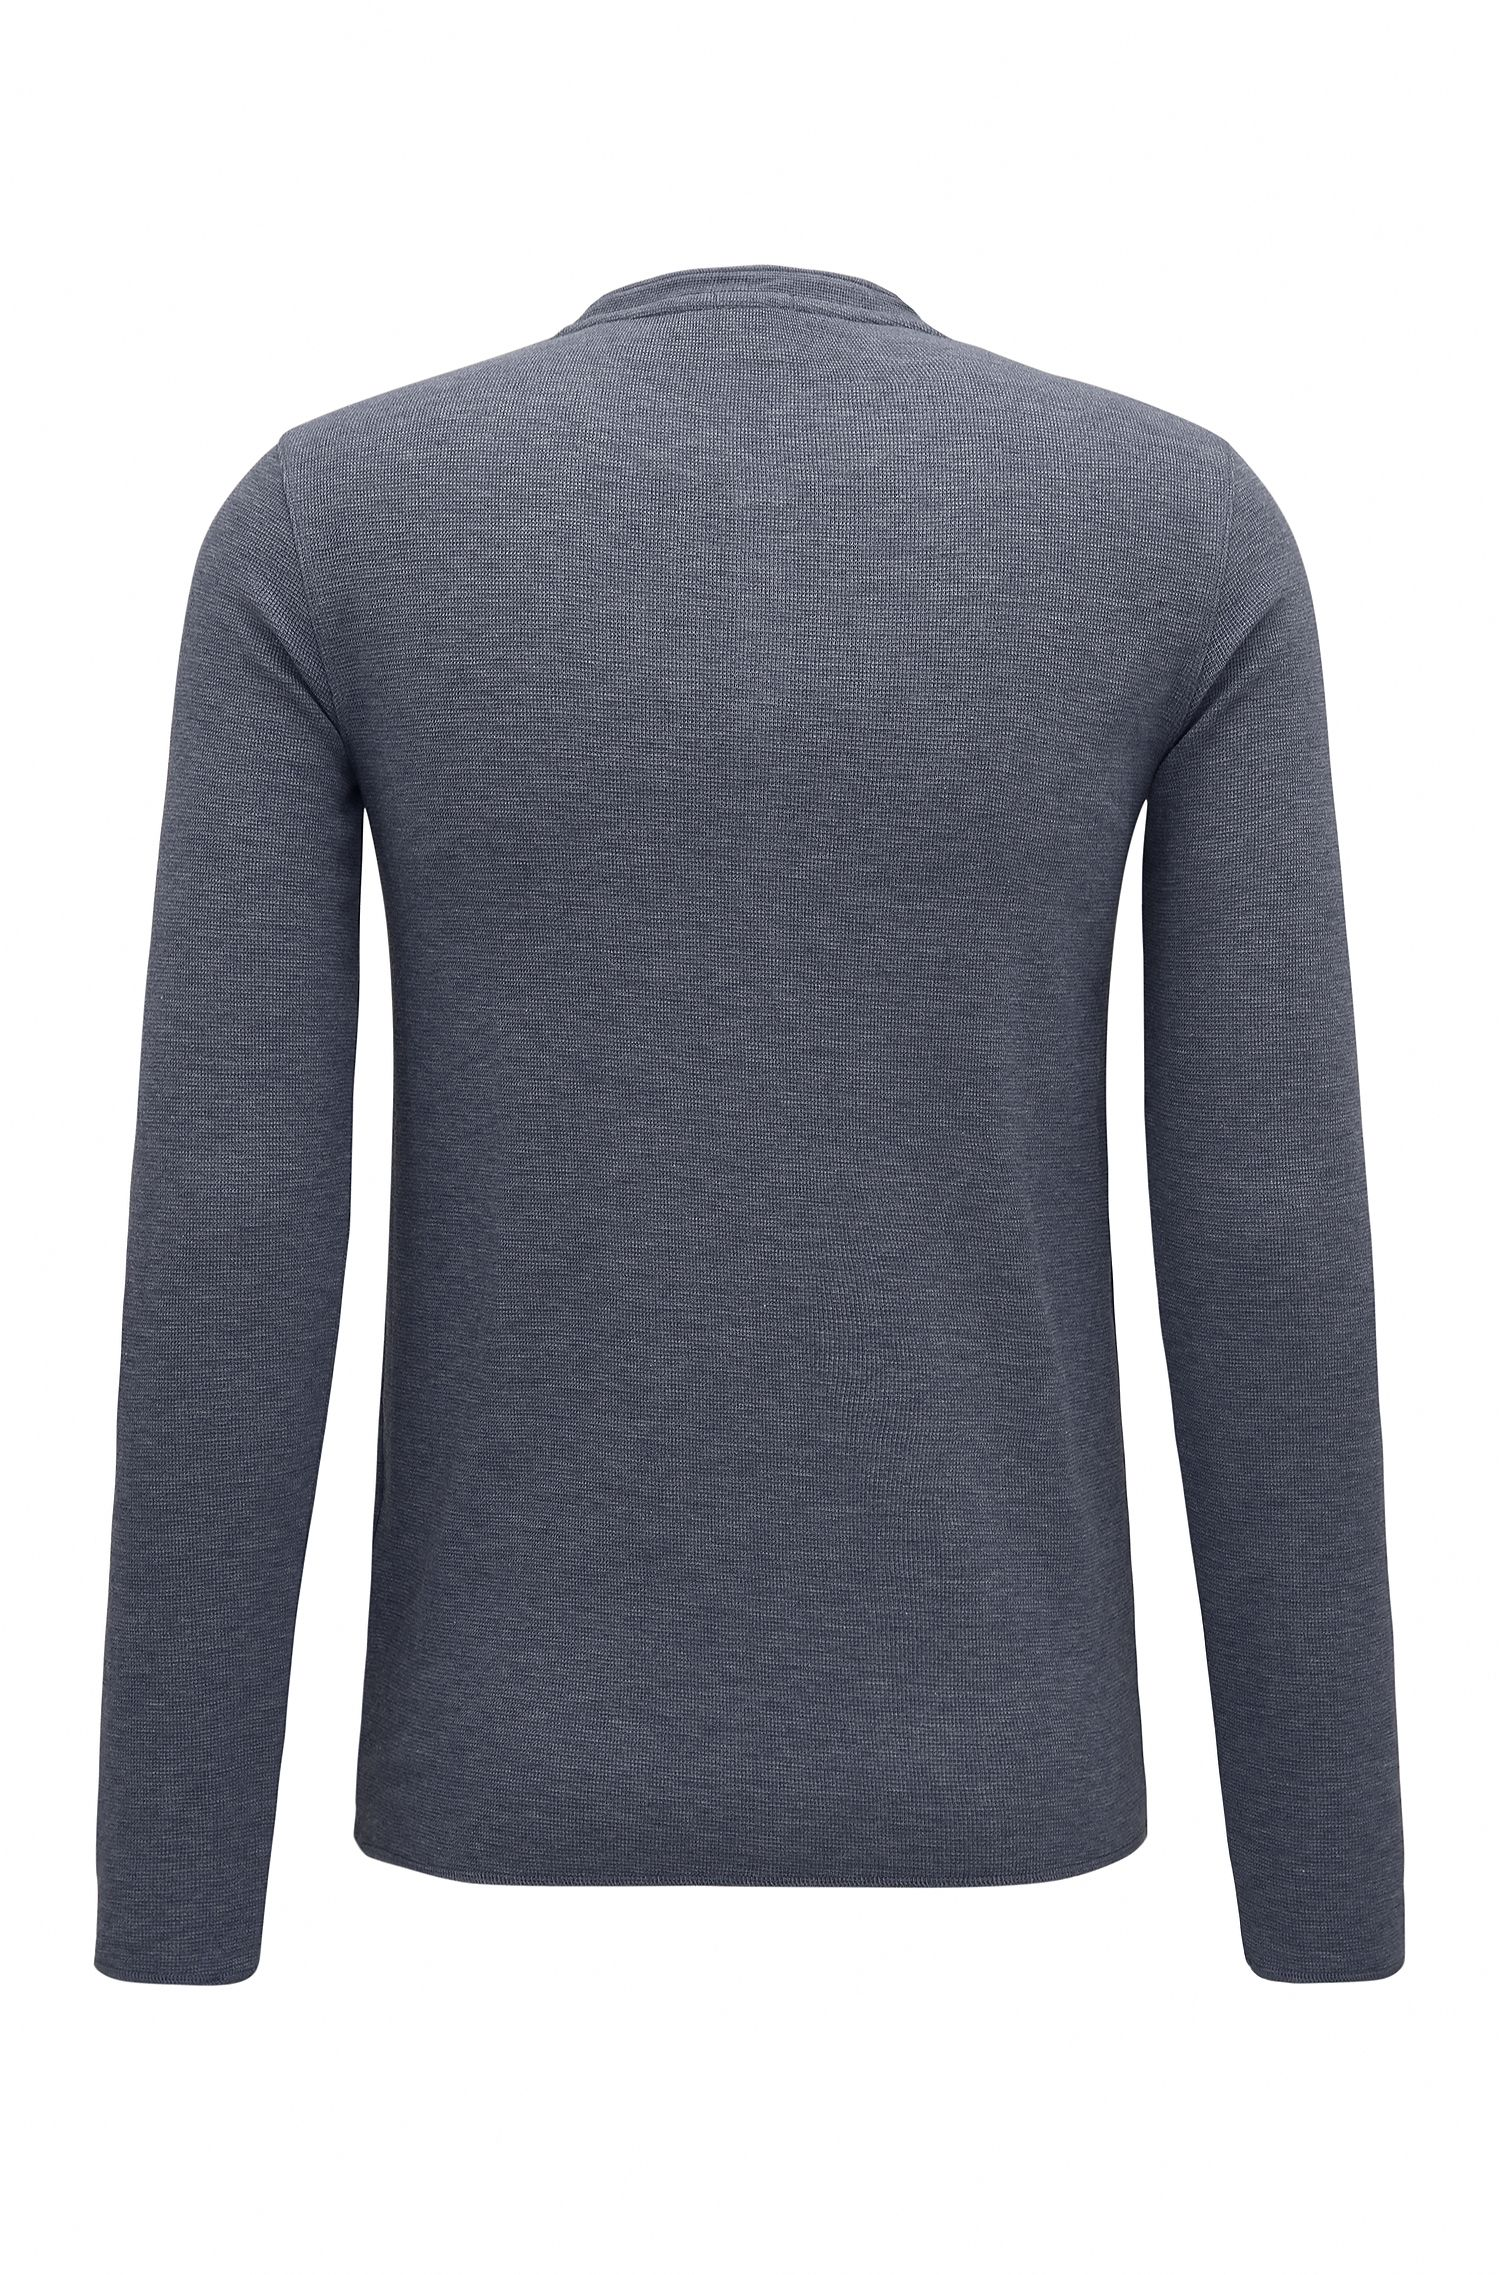 Cotton Waffle Henley Shirt   Topsider